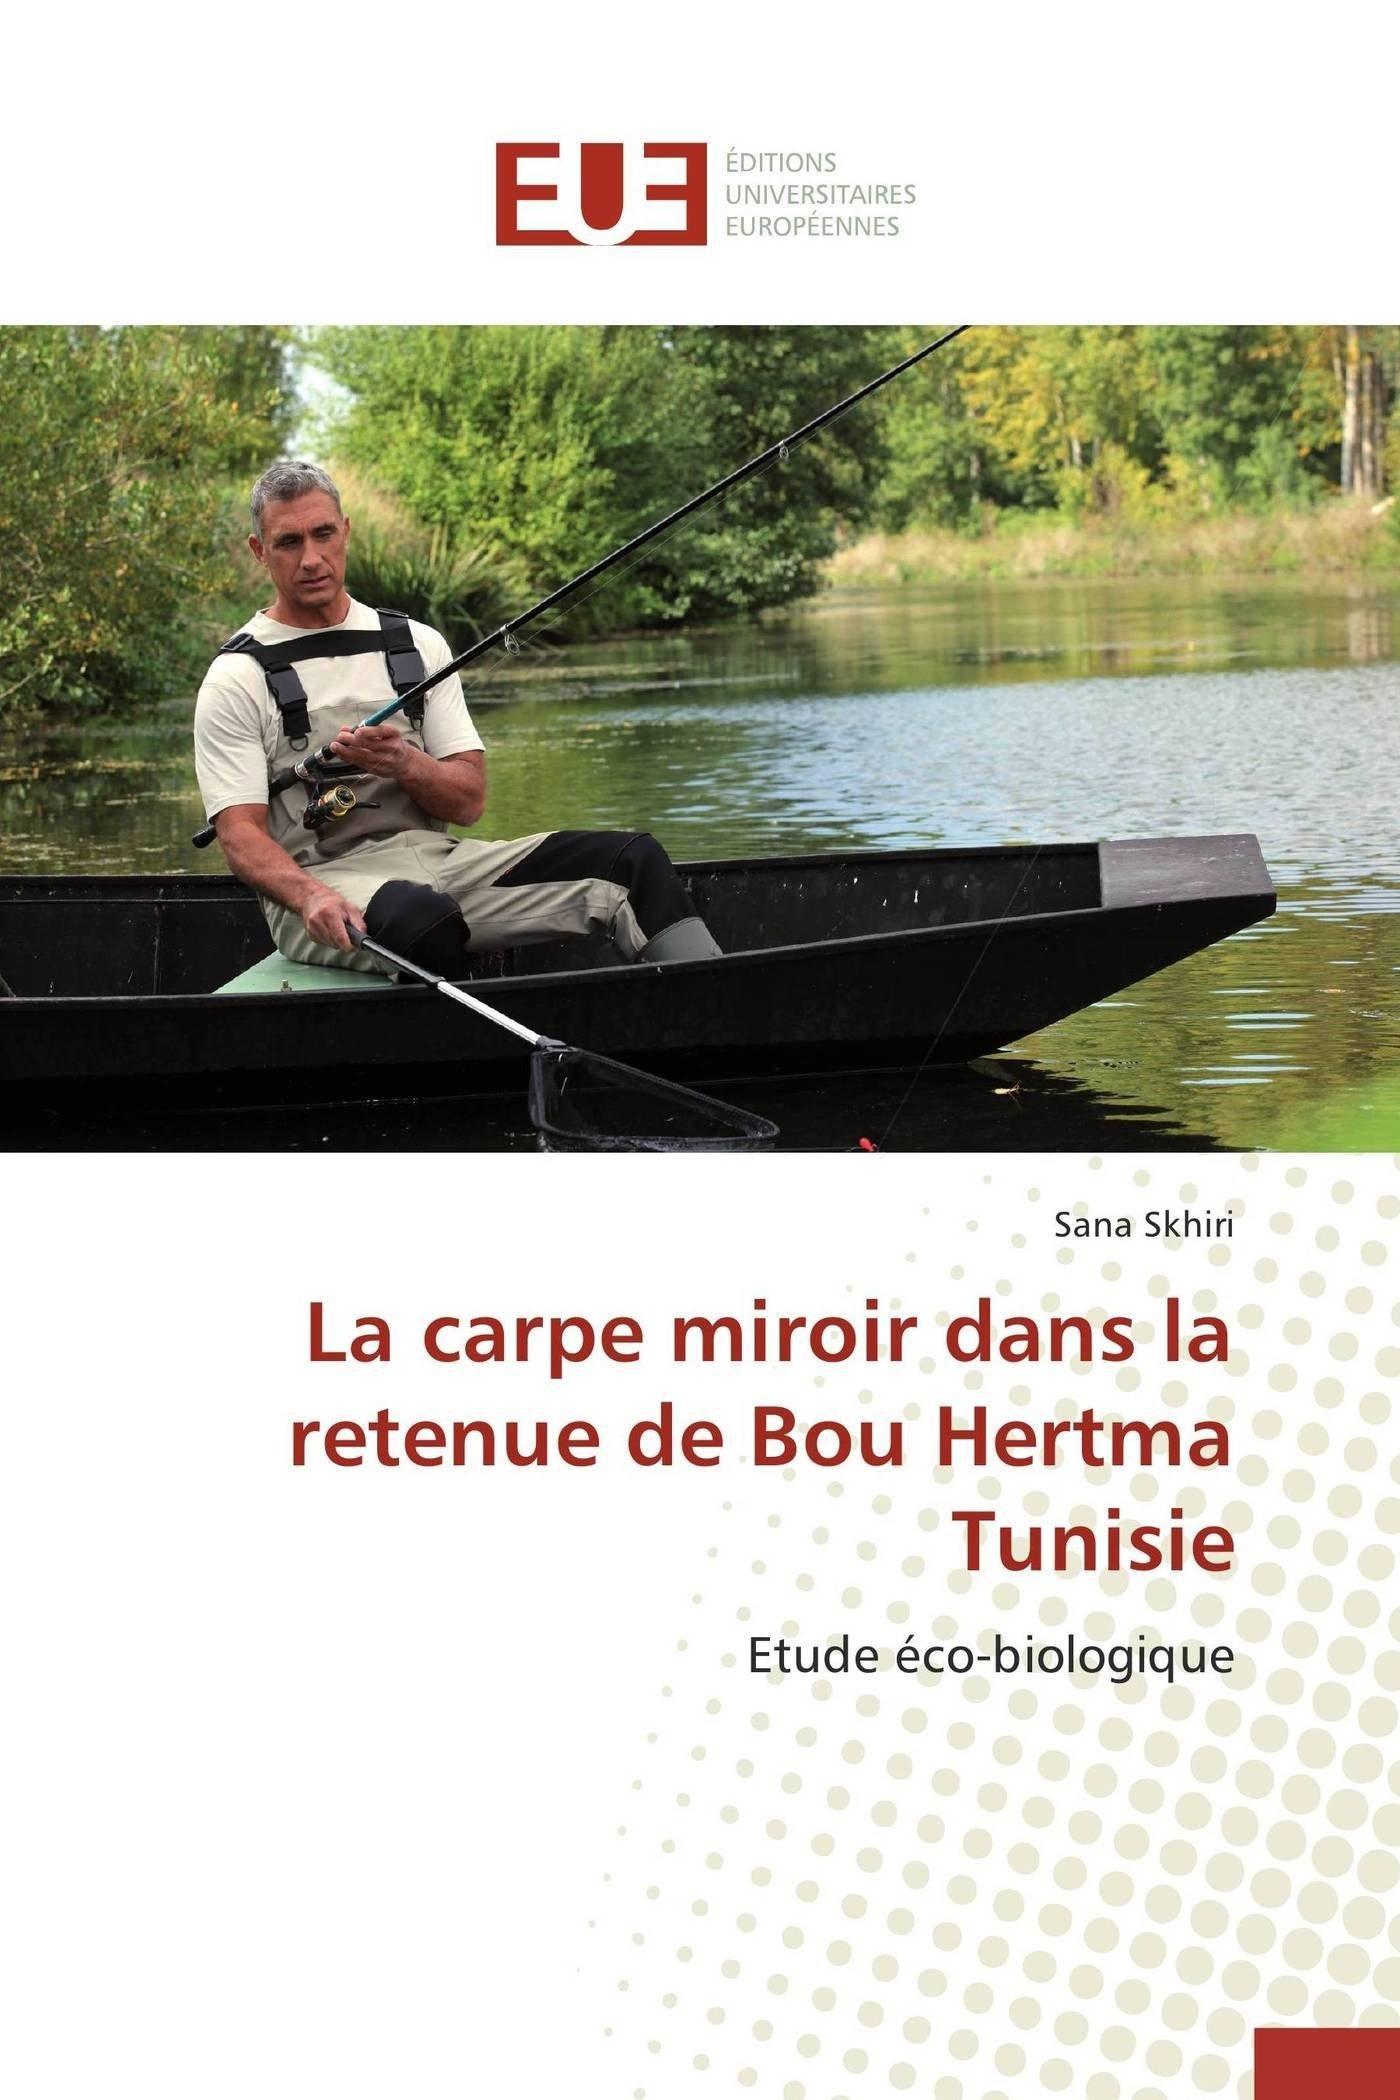 La carpe miroir dans la retenue de bou hertma tunisie (Omn.Univ.Europ.) (French Edition) PDF